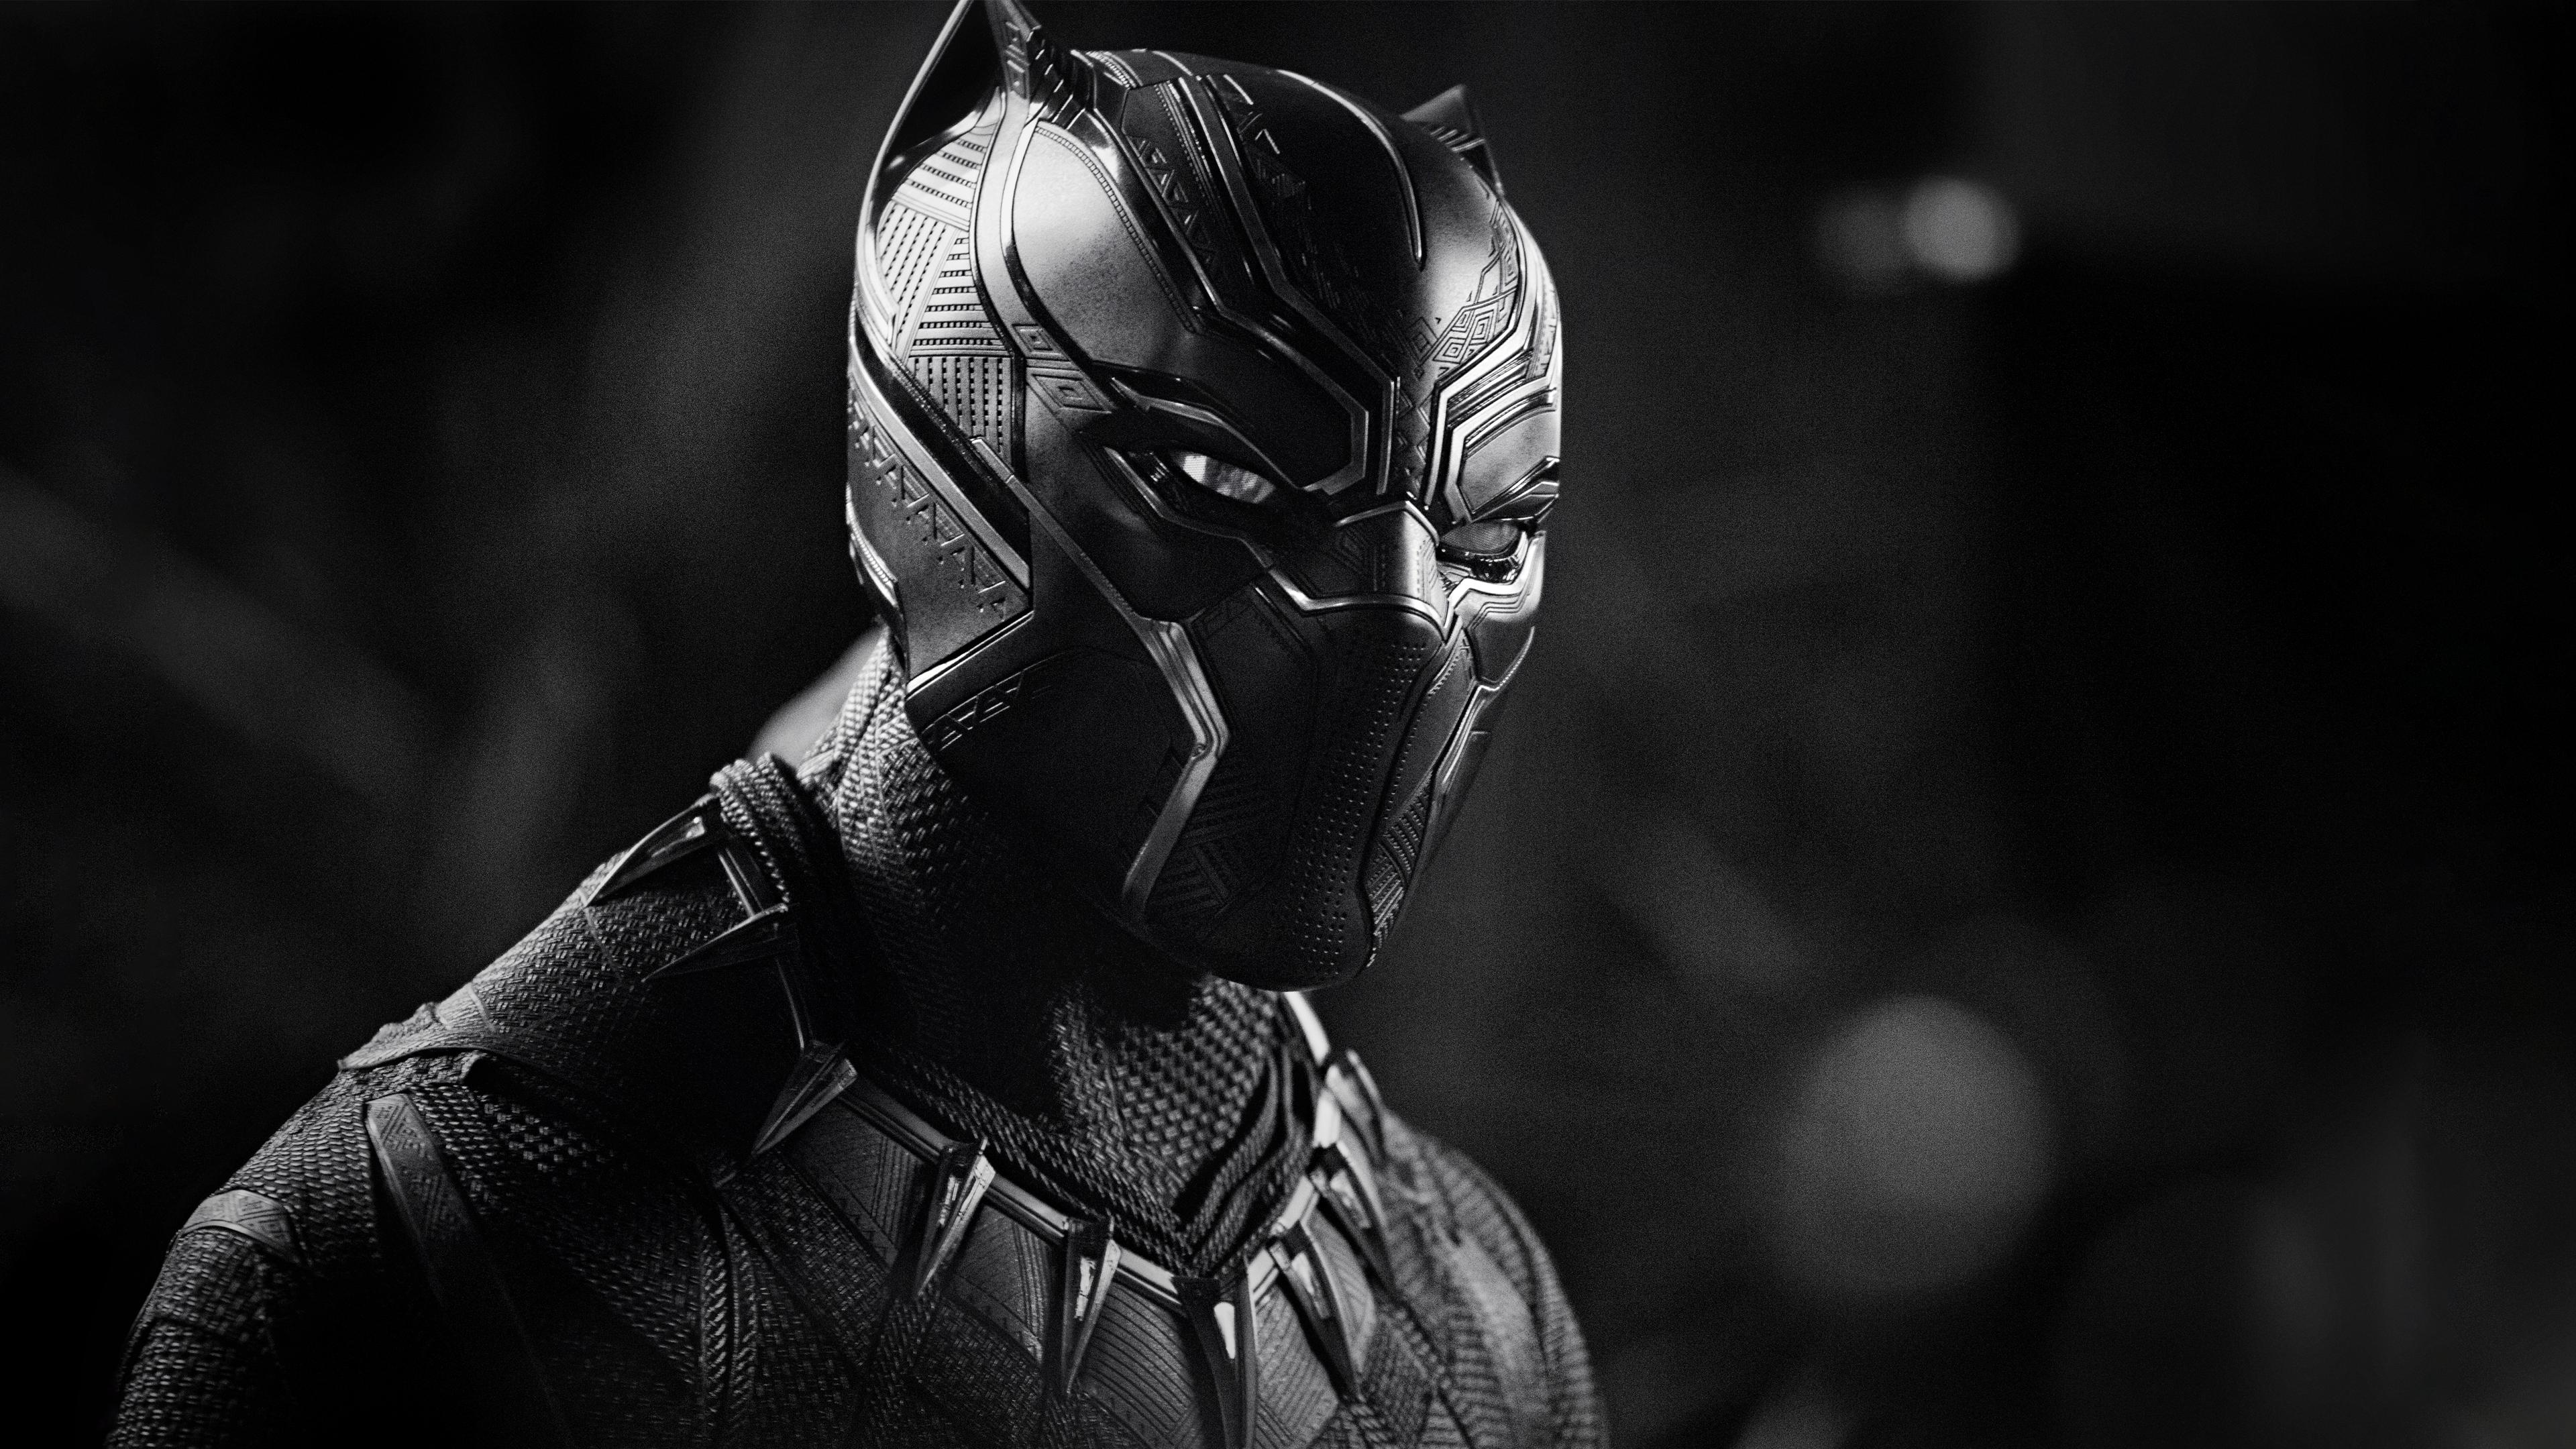 Desktop Black Panther 4k Wallpapers Wallpaper Cave